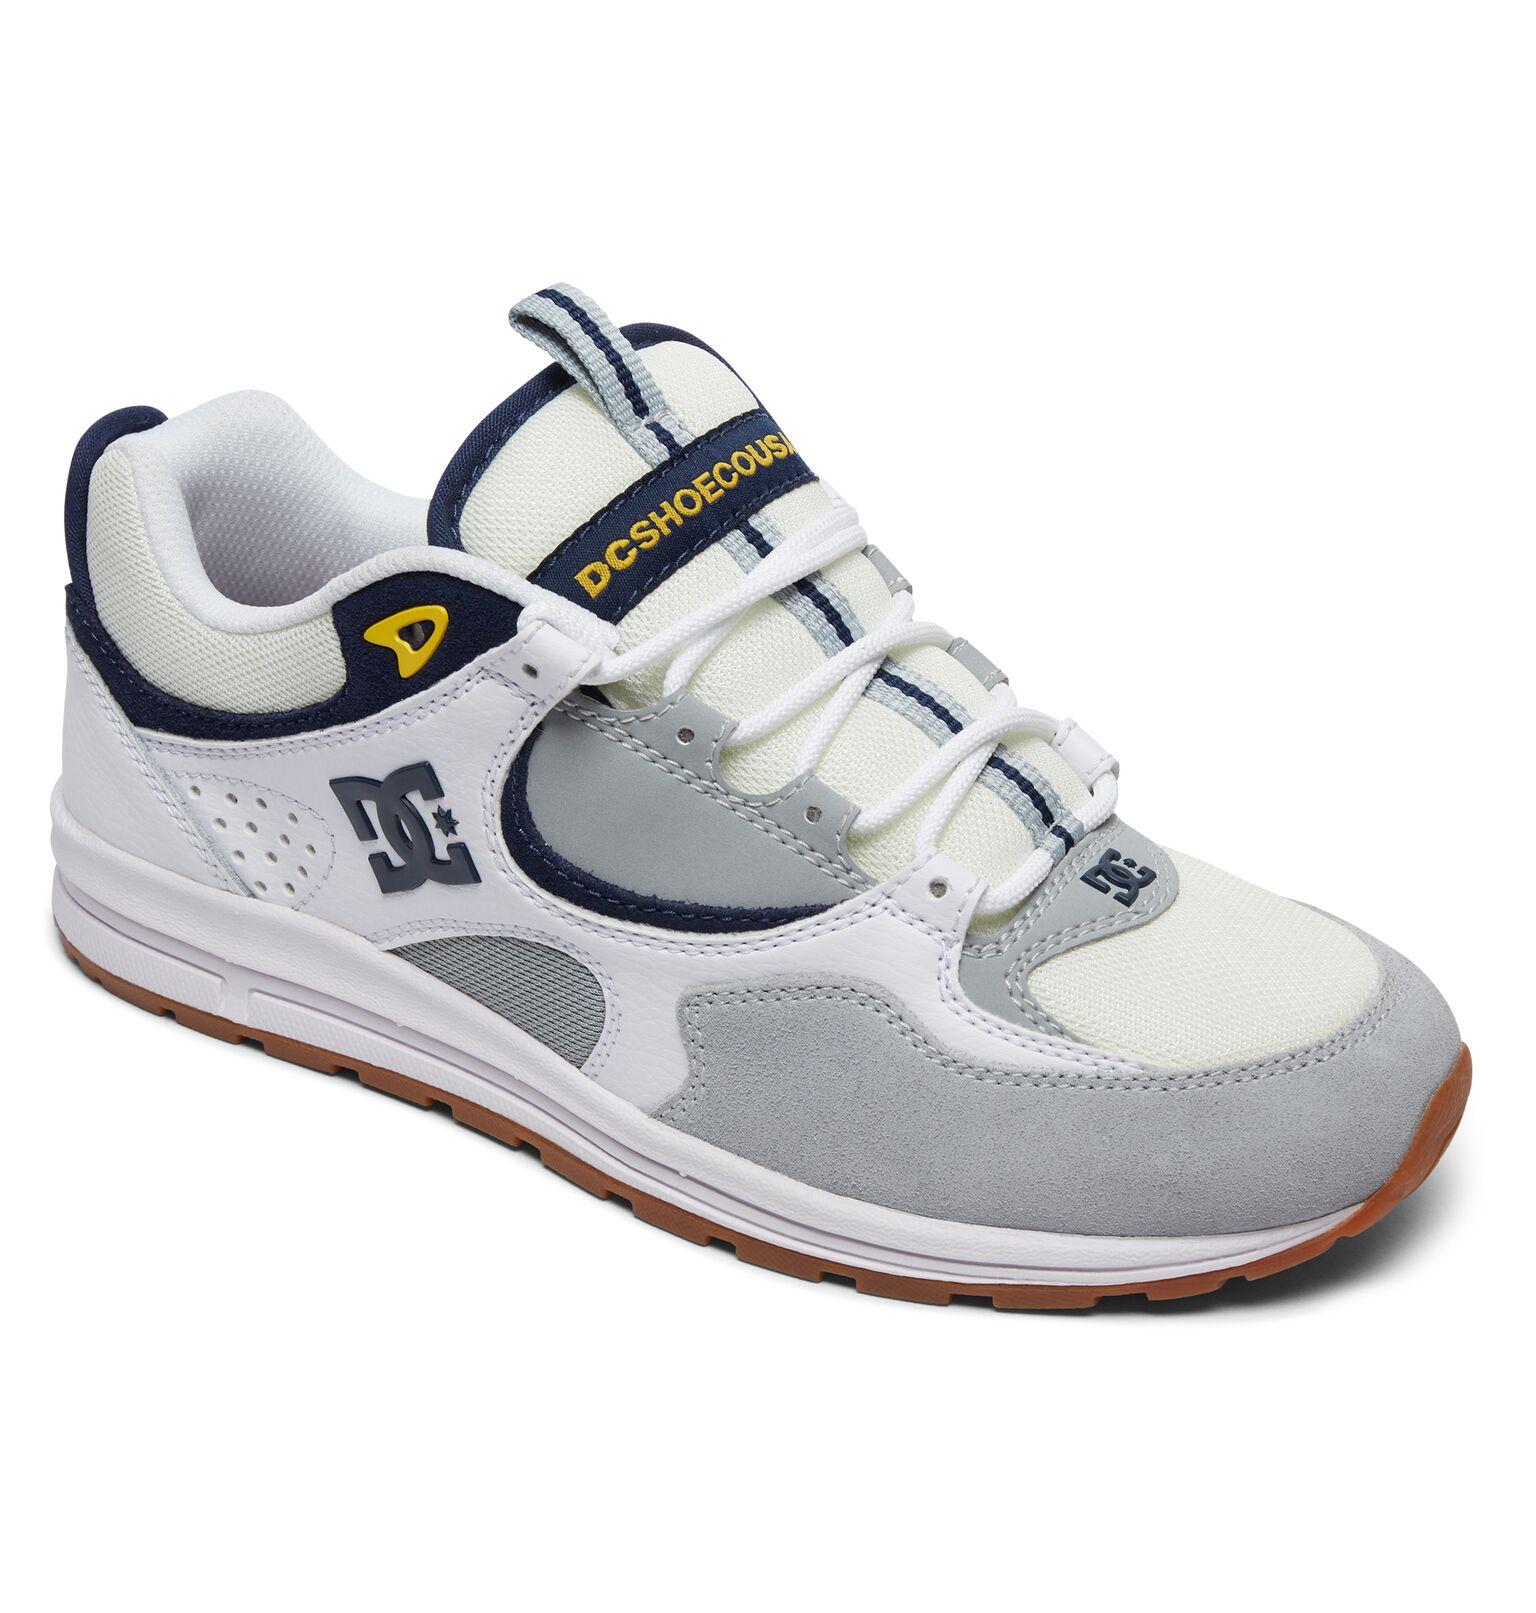 85ff7a1b3d DC Shoes 94 collection kalis lite - WearTesters